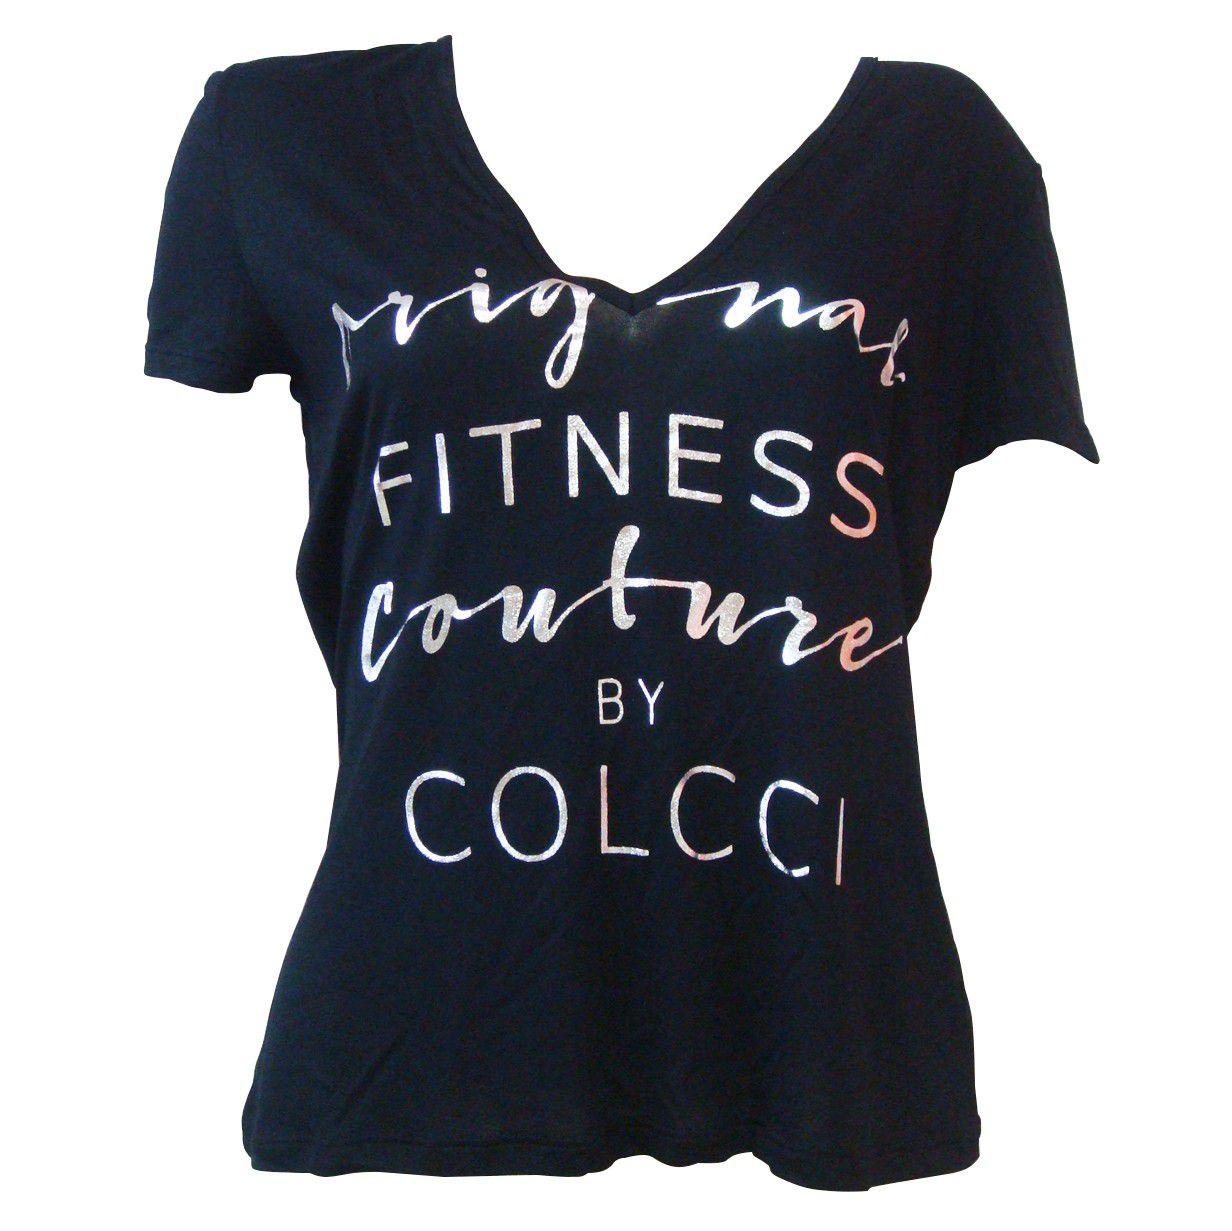 COLCCI T-SHIRT FEM MC EST